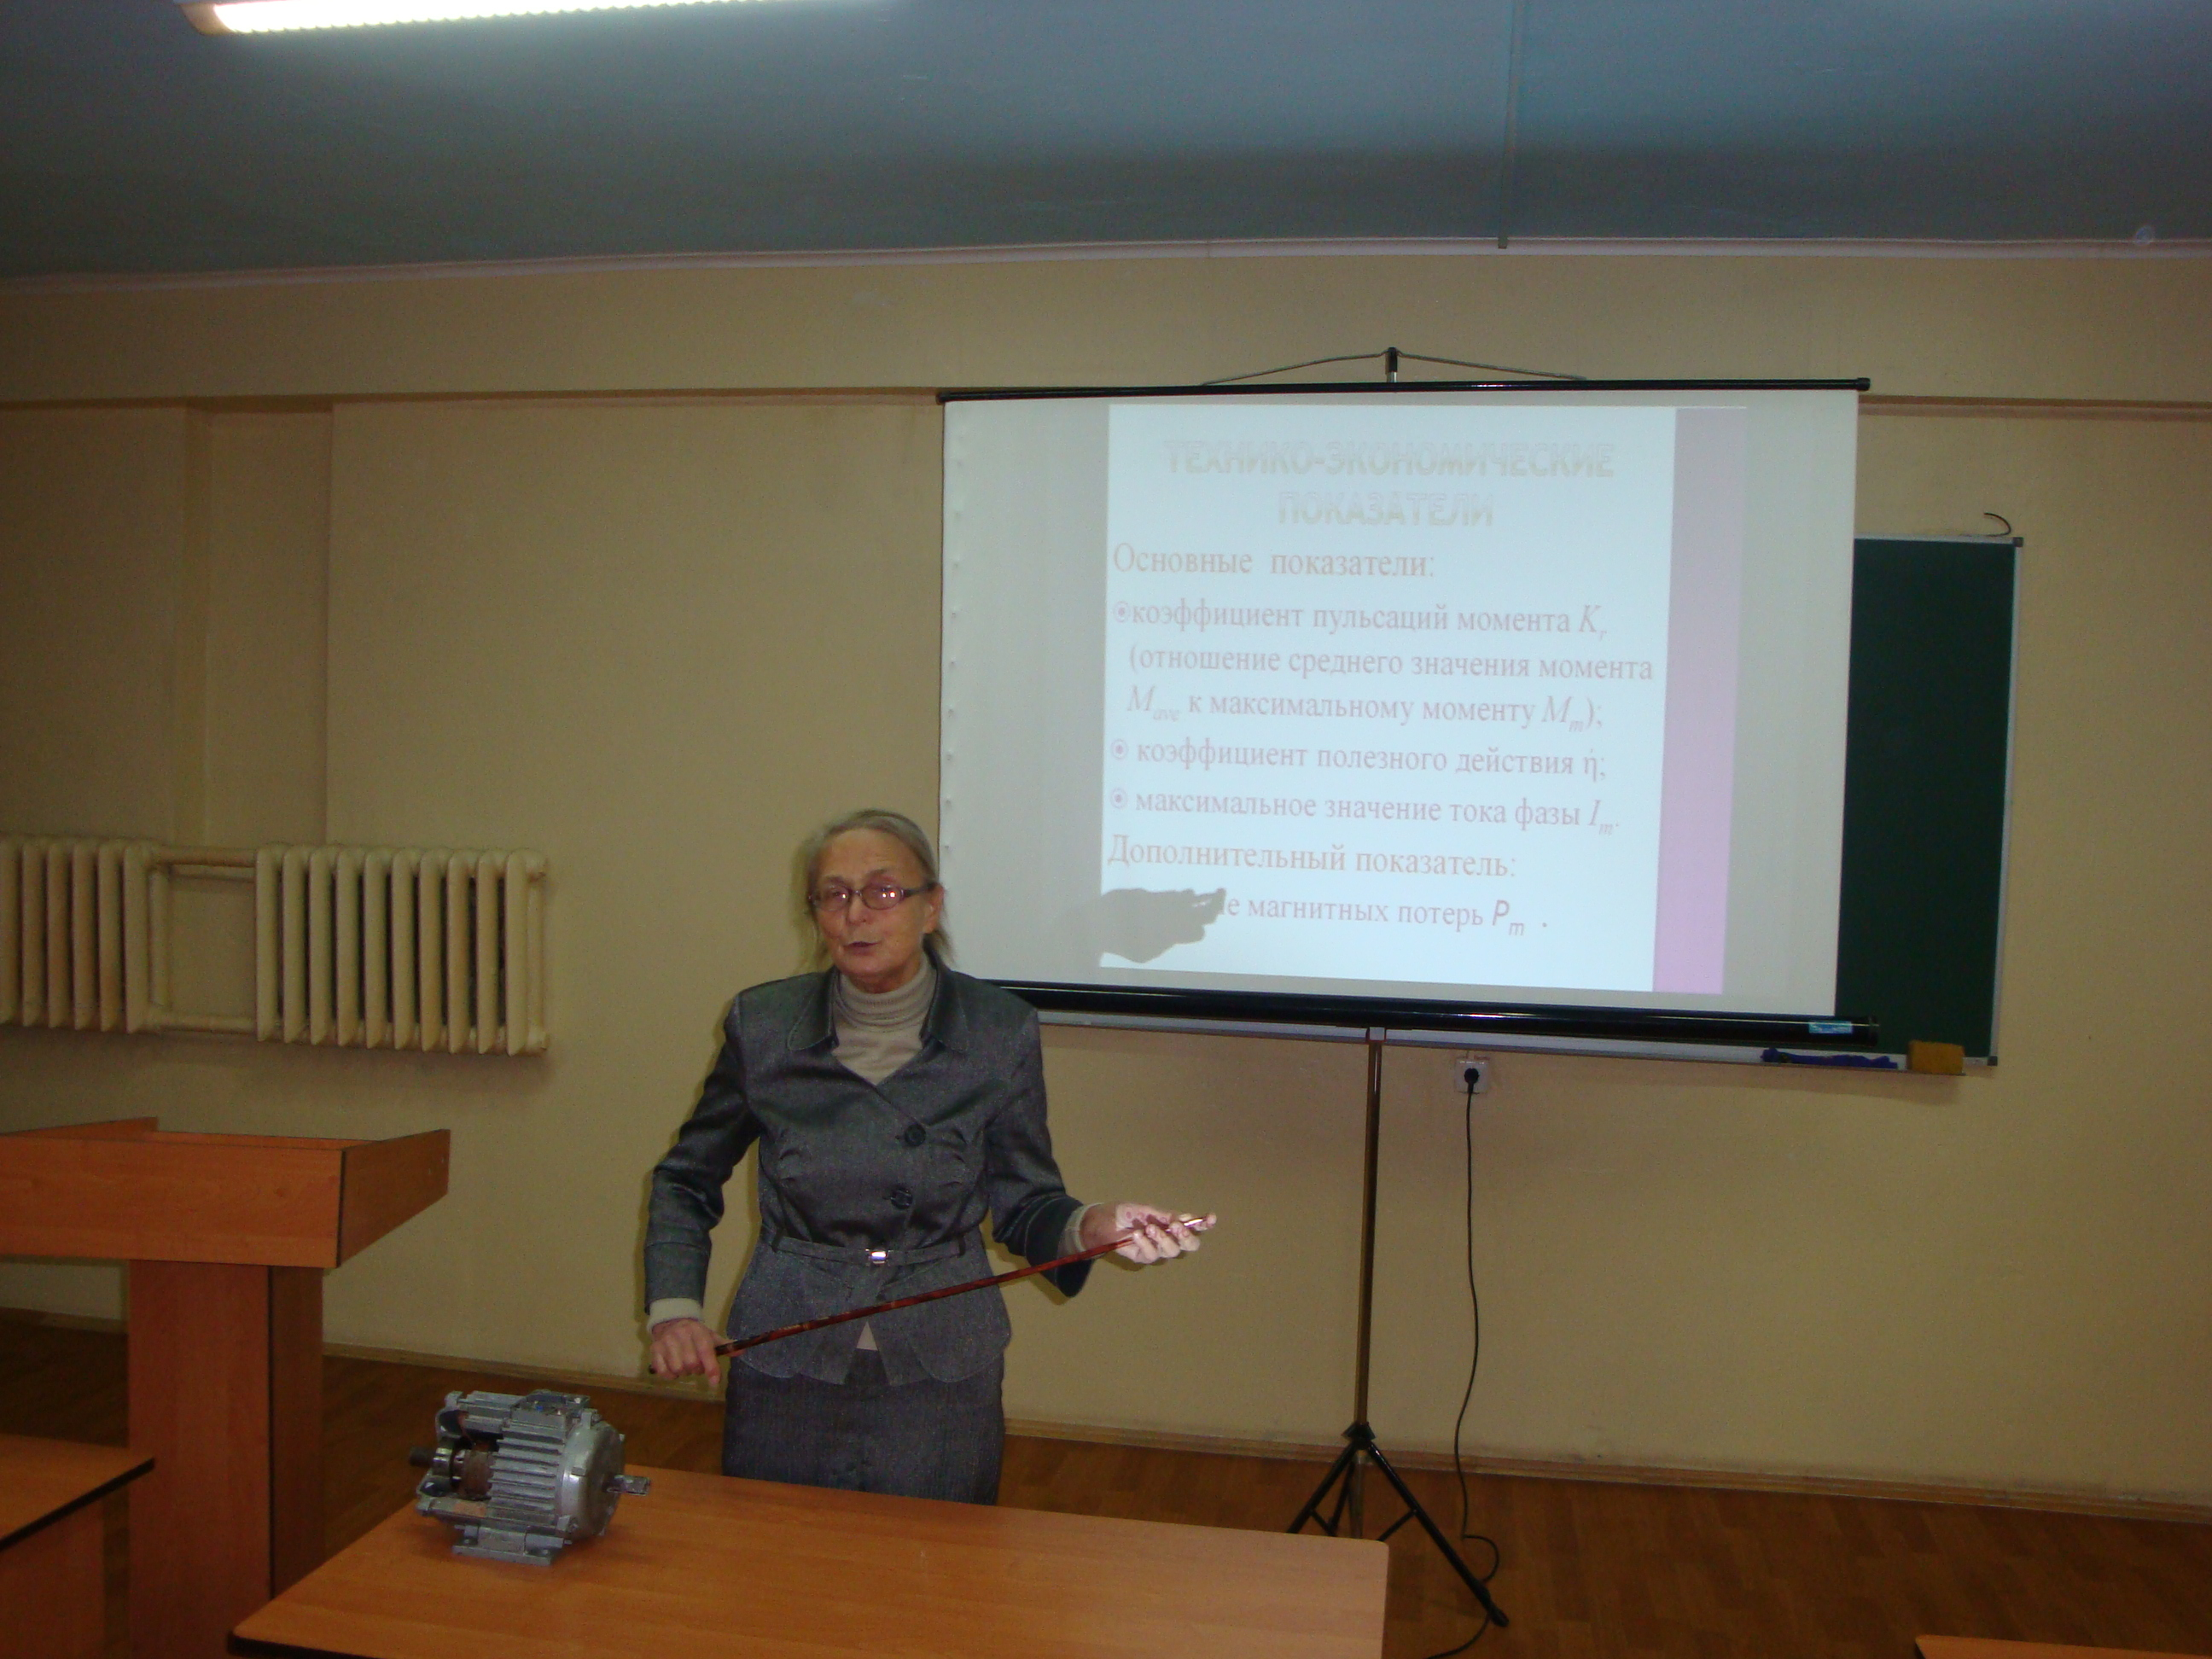 Доц. Галайко Л.П. (НТУ «ХПИ», Харьков)